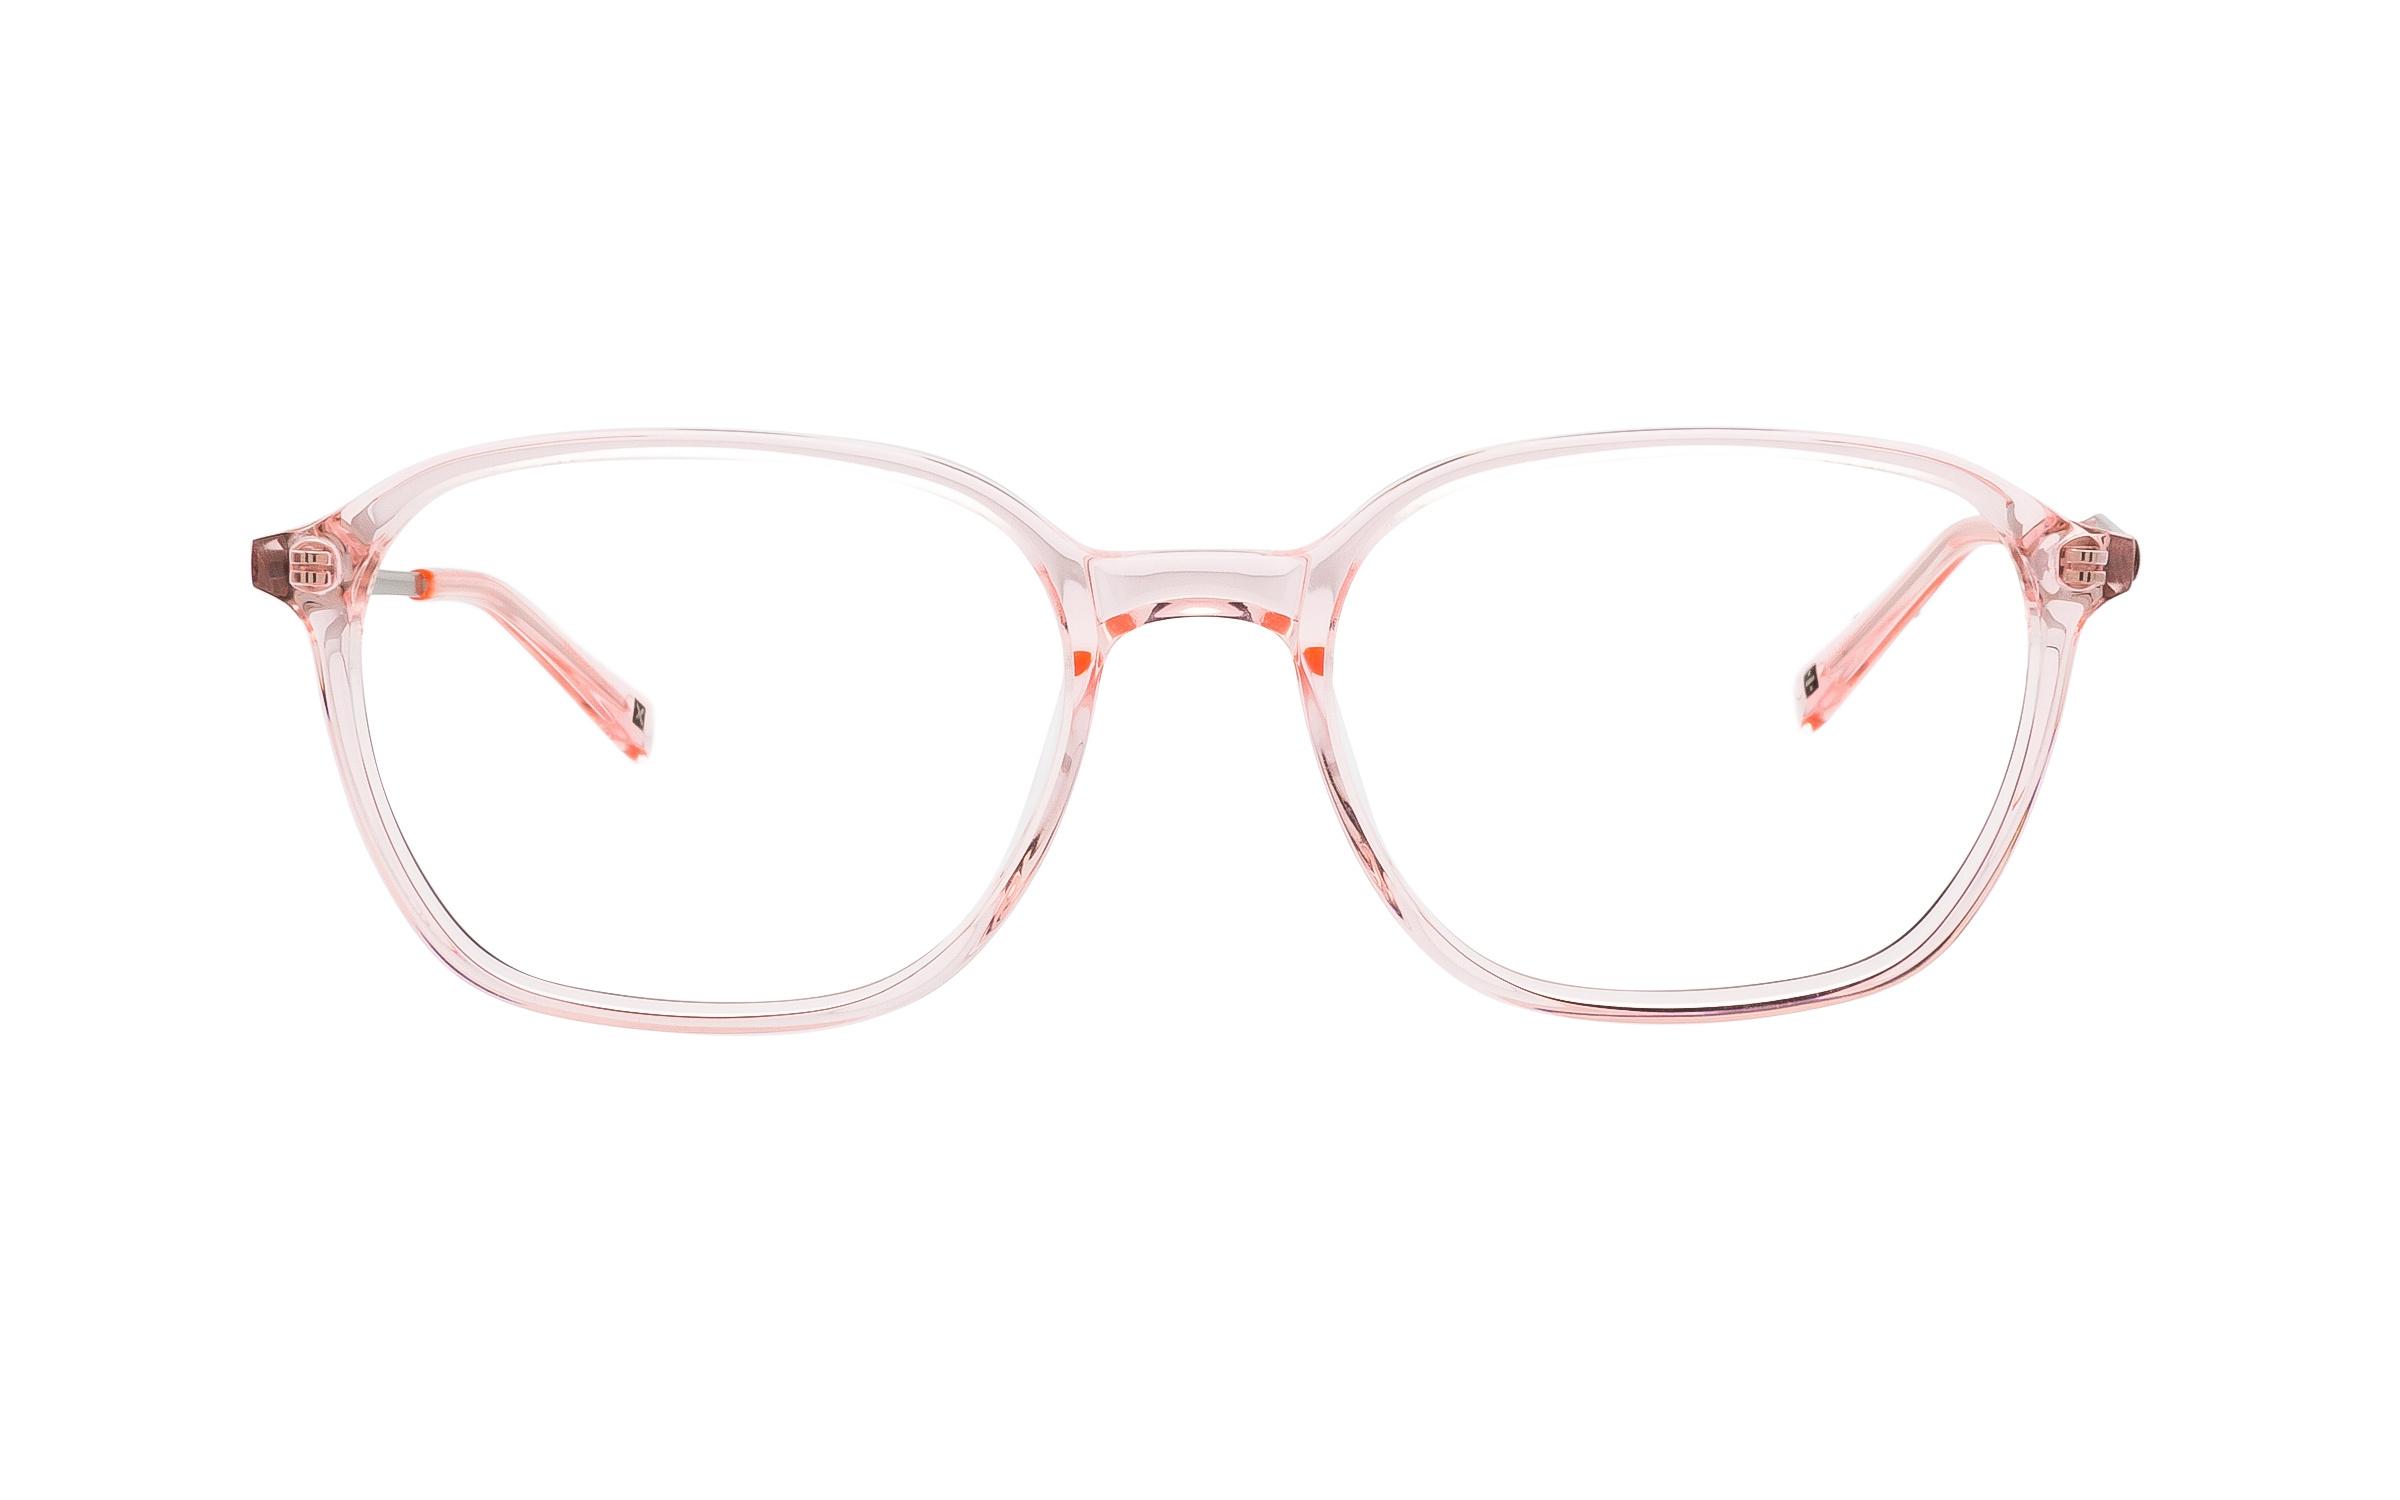 http://www.coastal.com/ - Derek Cardigan Caelum DC236 C04 (53) Eyeglasses and Frame in Shiny Crystal Pink | Acetate – Online Coastal